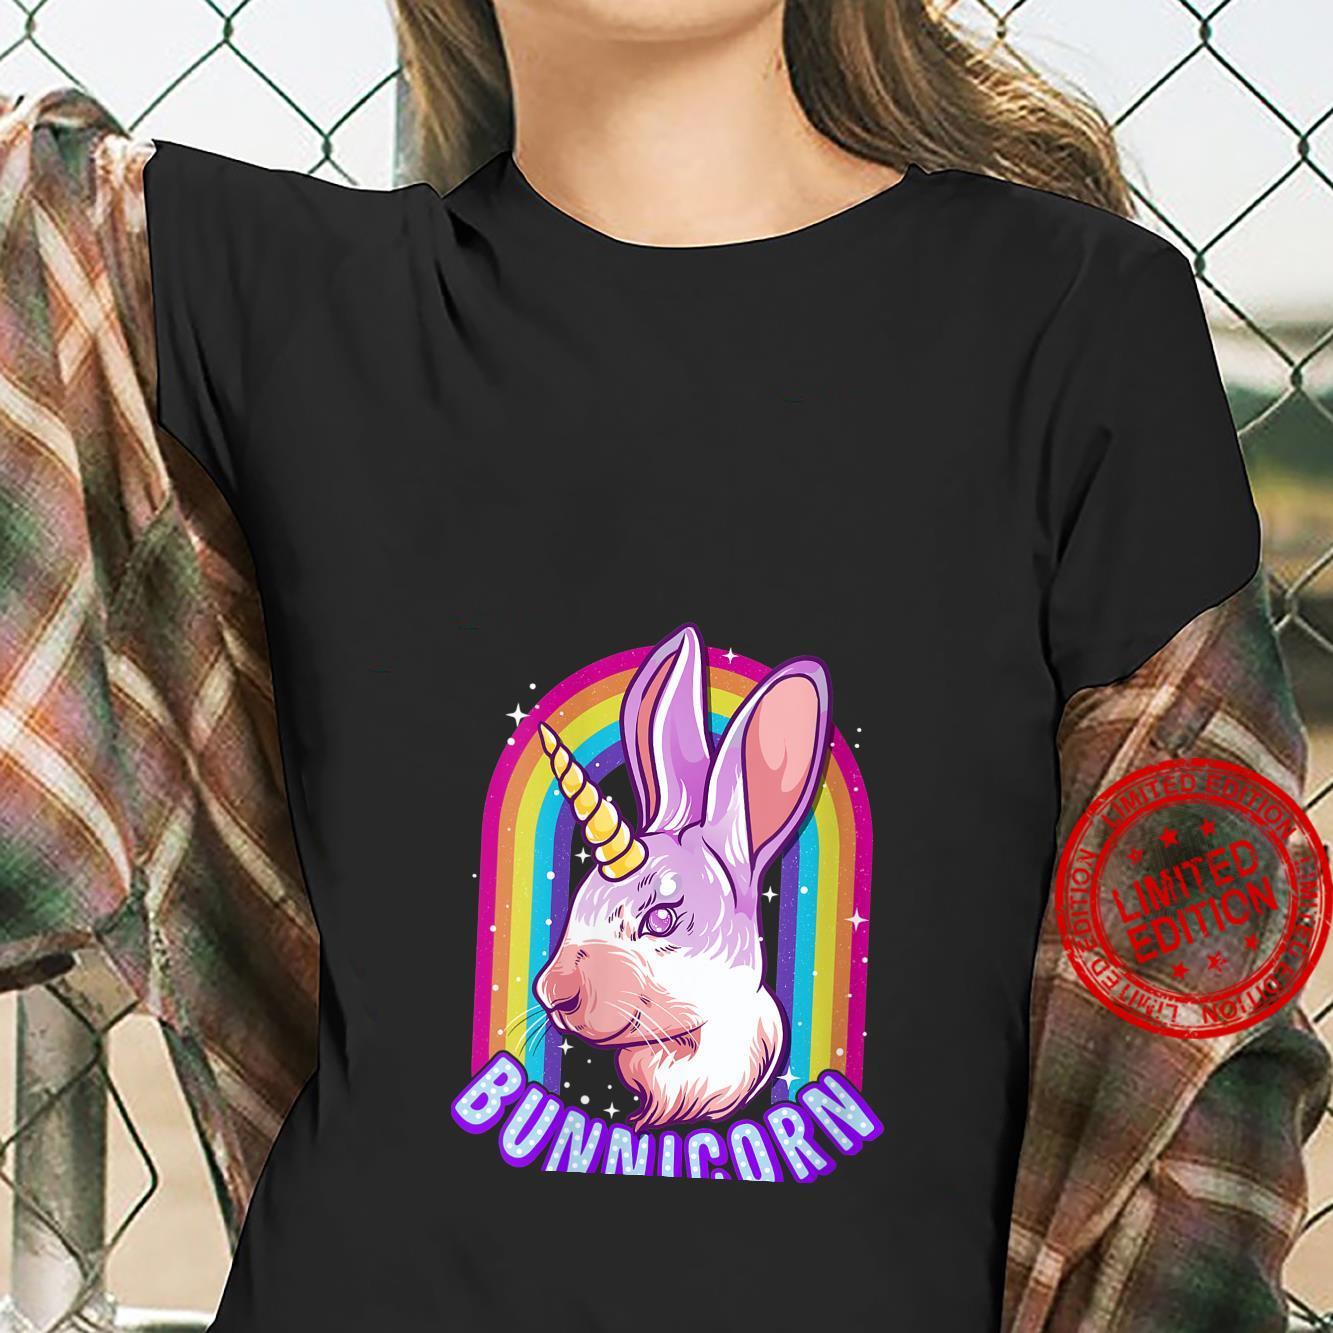 Womens Bunnicorn Rainbow Cute Bunny Rabbit Unicorn Shirt ladies tee